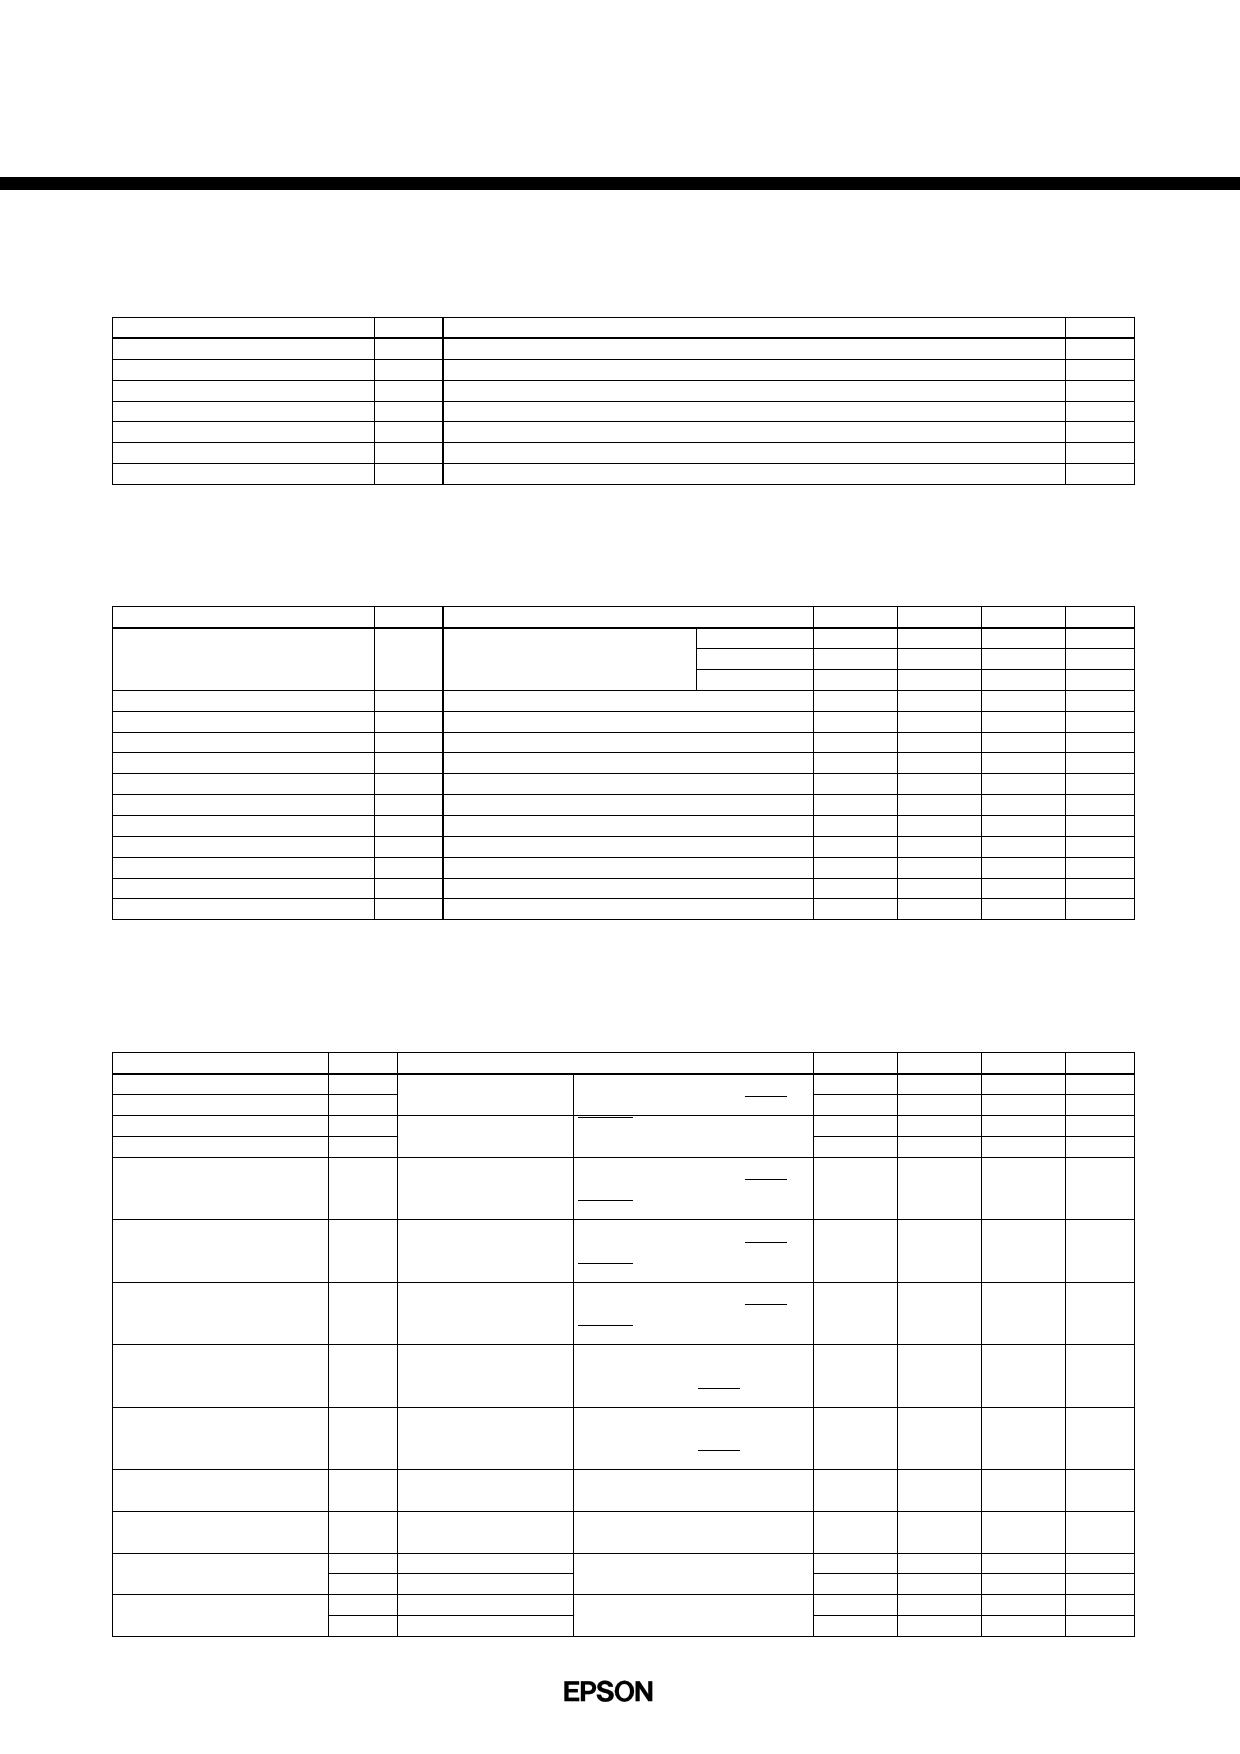 E0C624A pdf, 반도체, 판매, 대치품